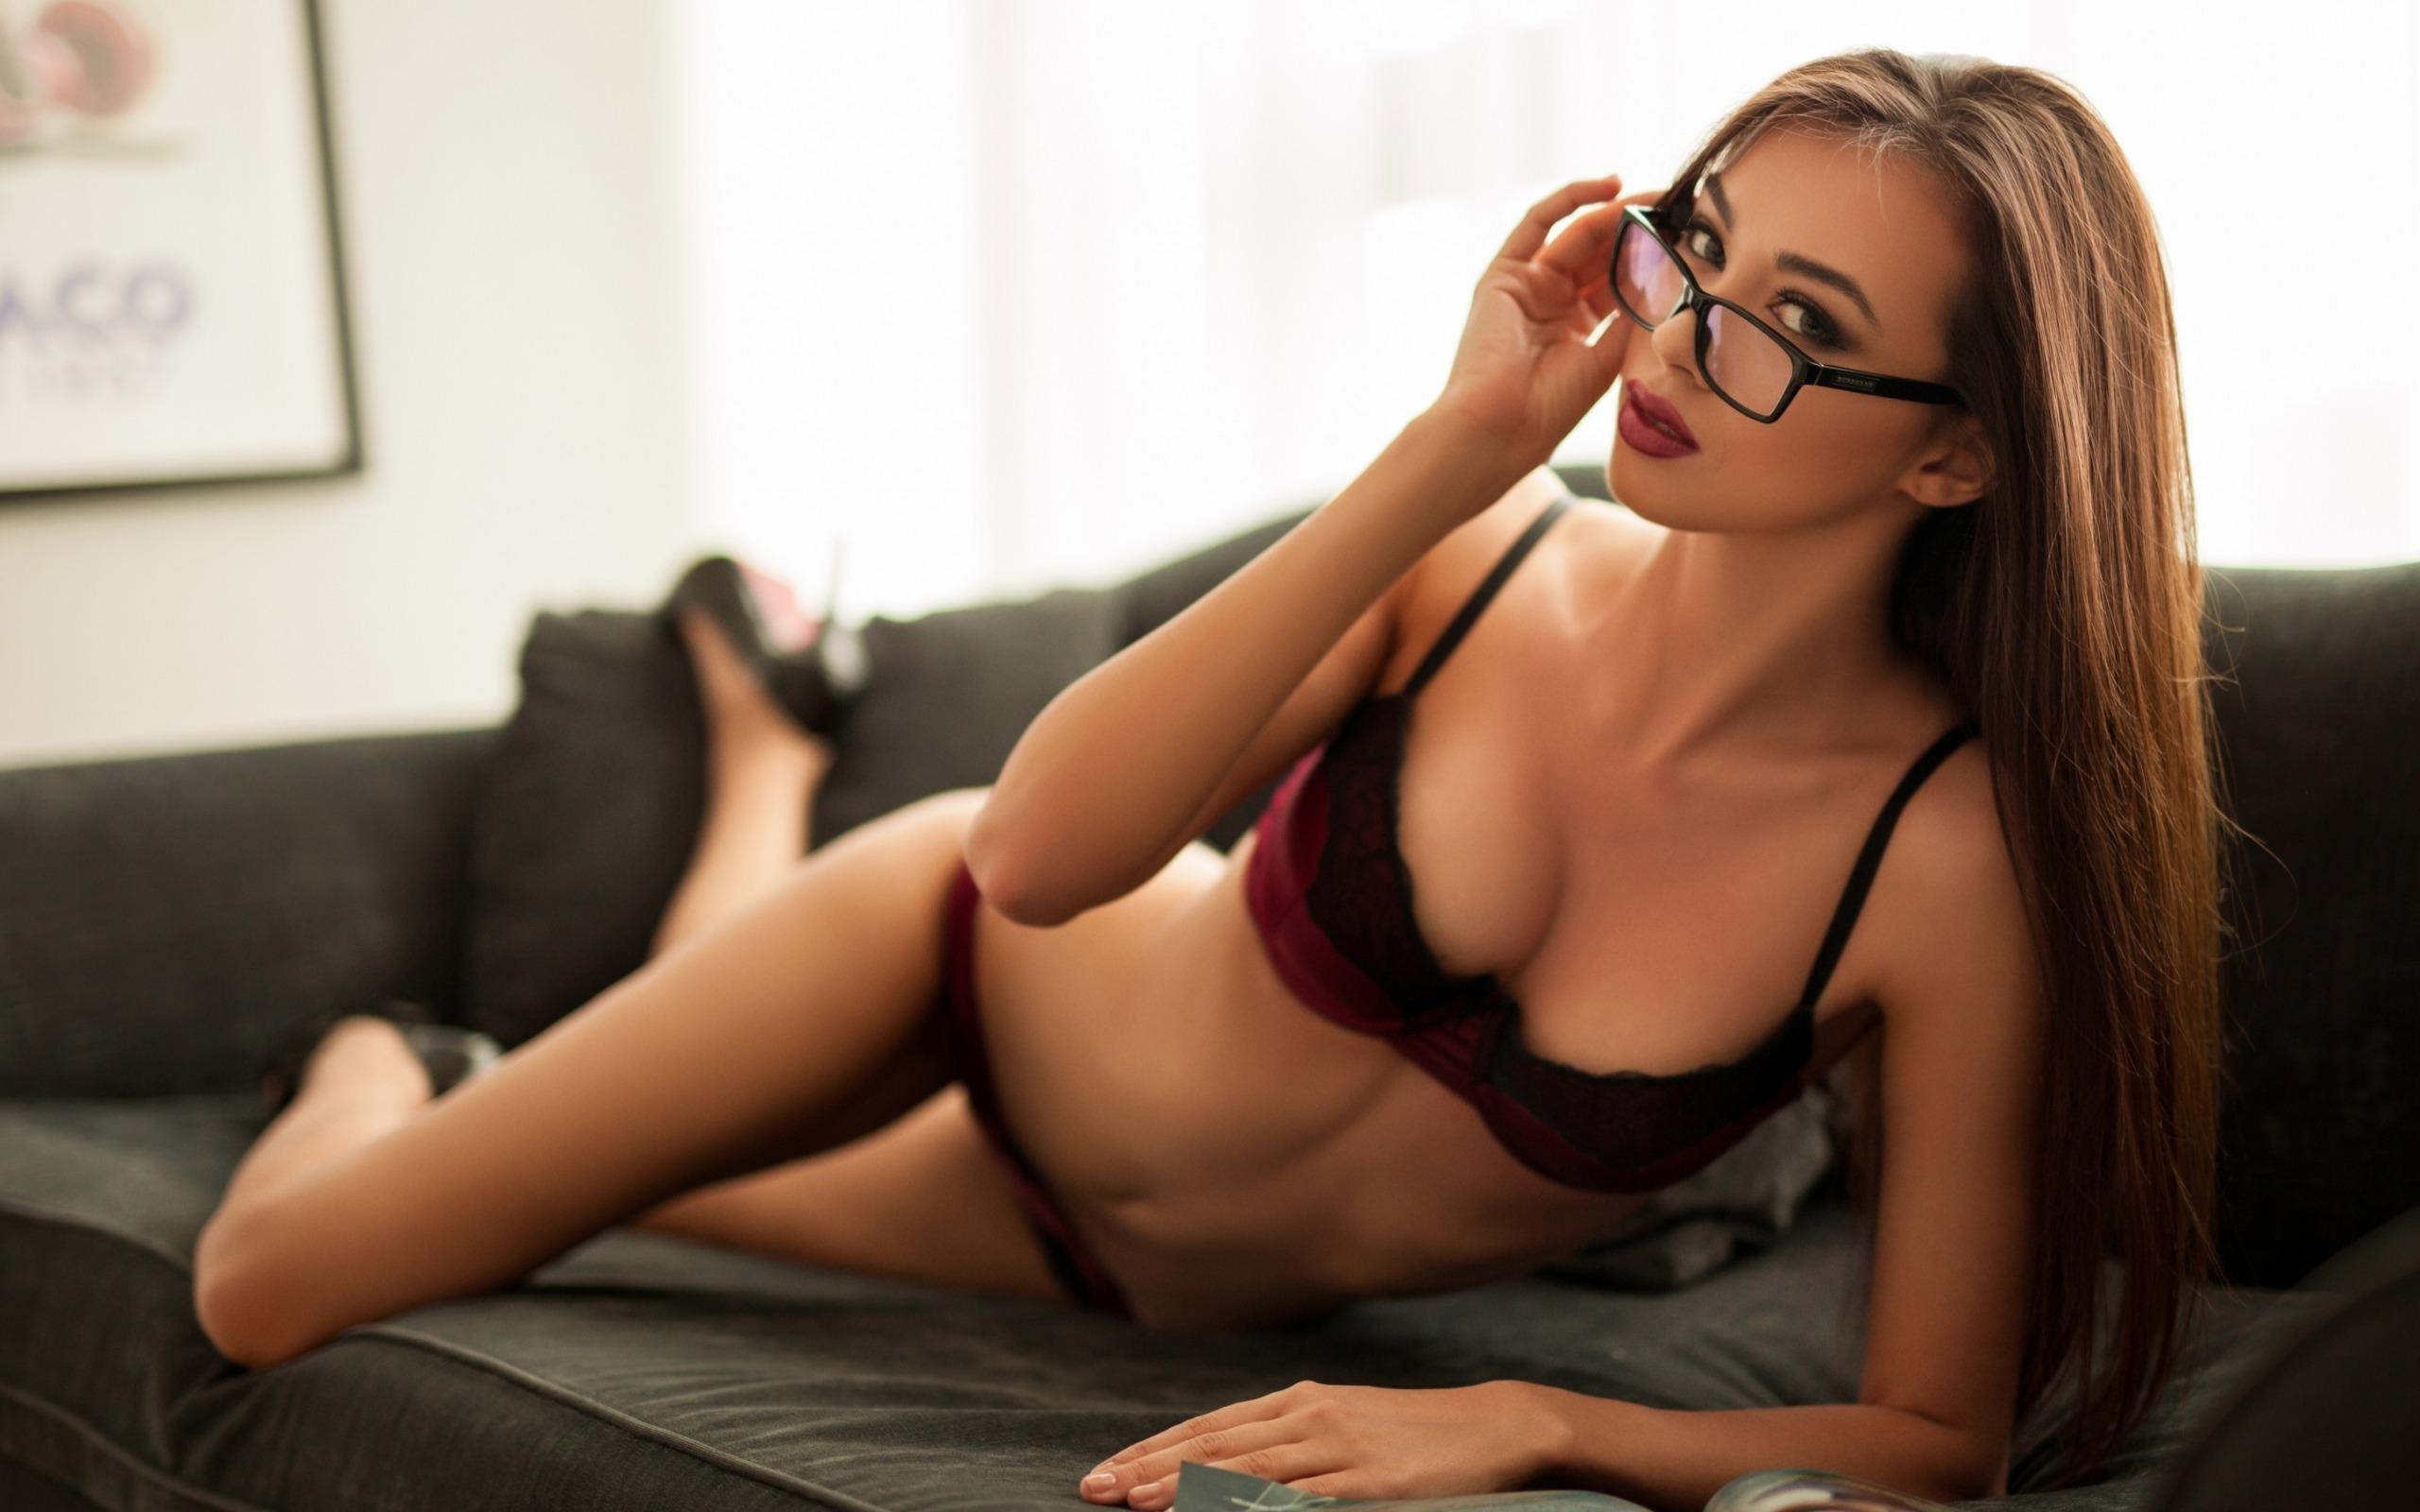 Nude mature women wearing glasses